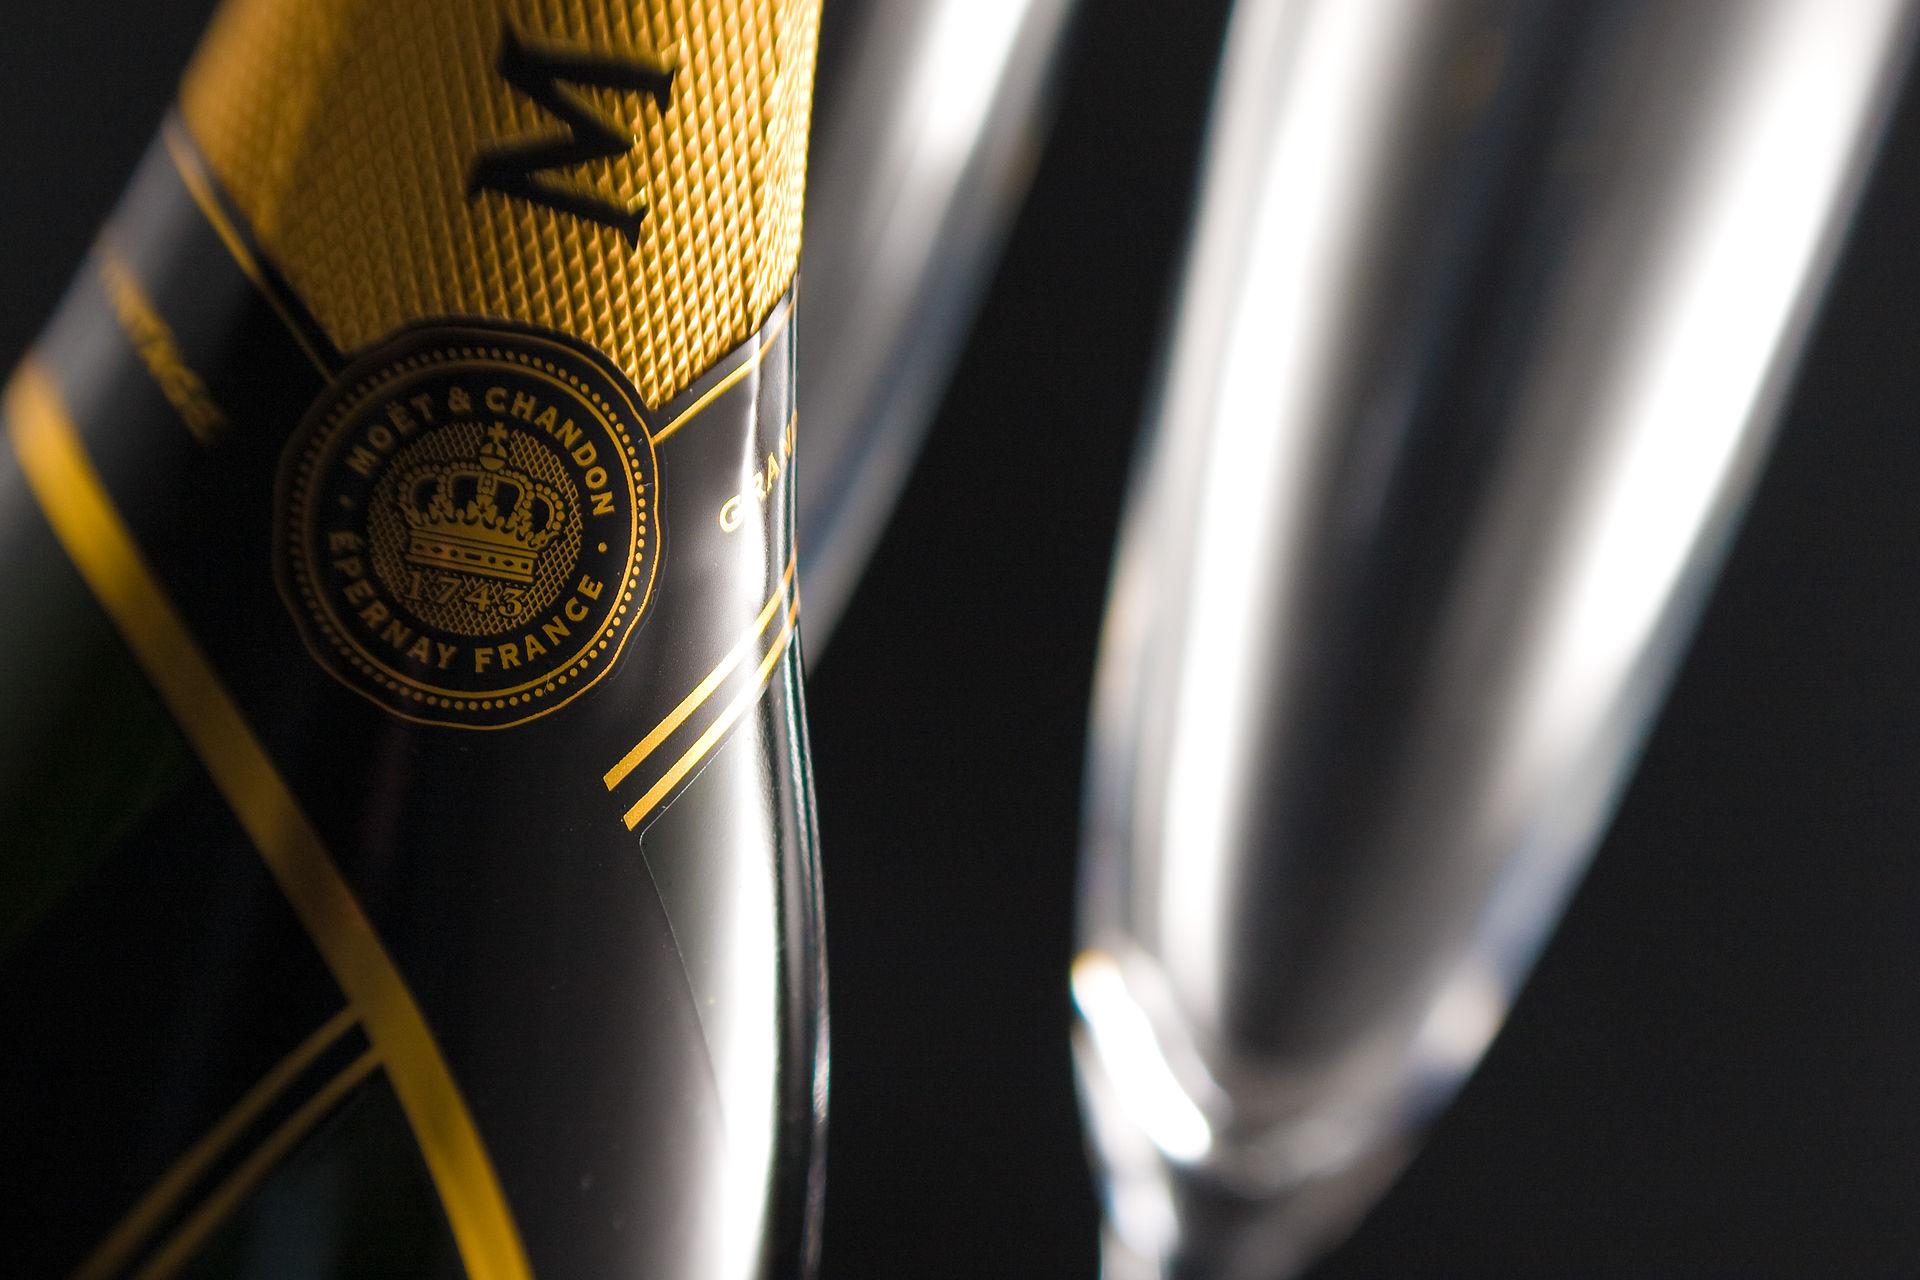 Lvmh Moet Hennessy Louis Vuitton